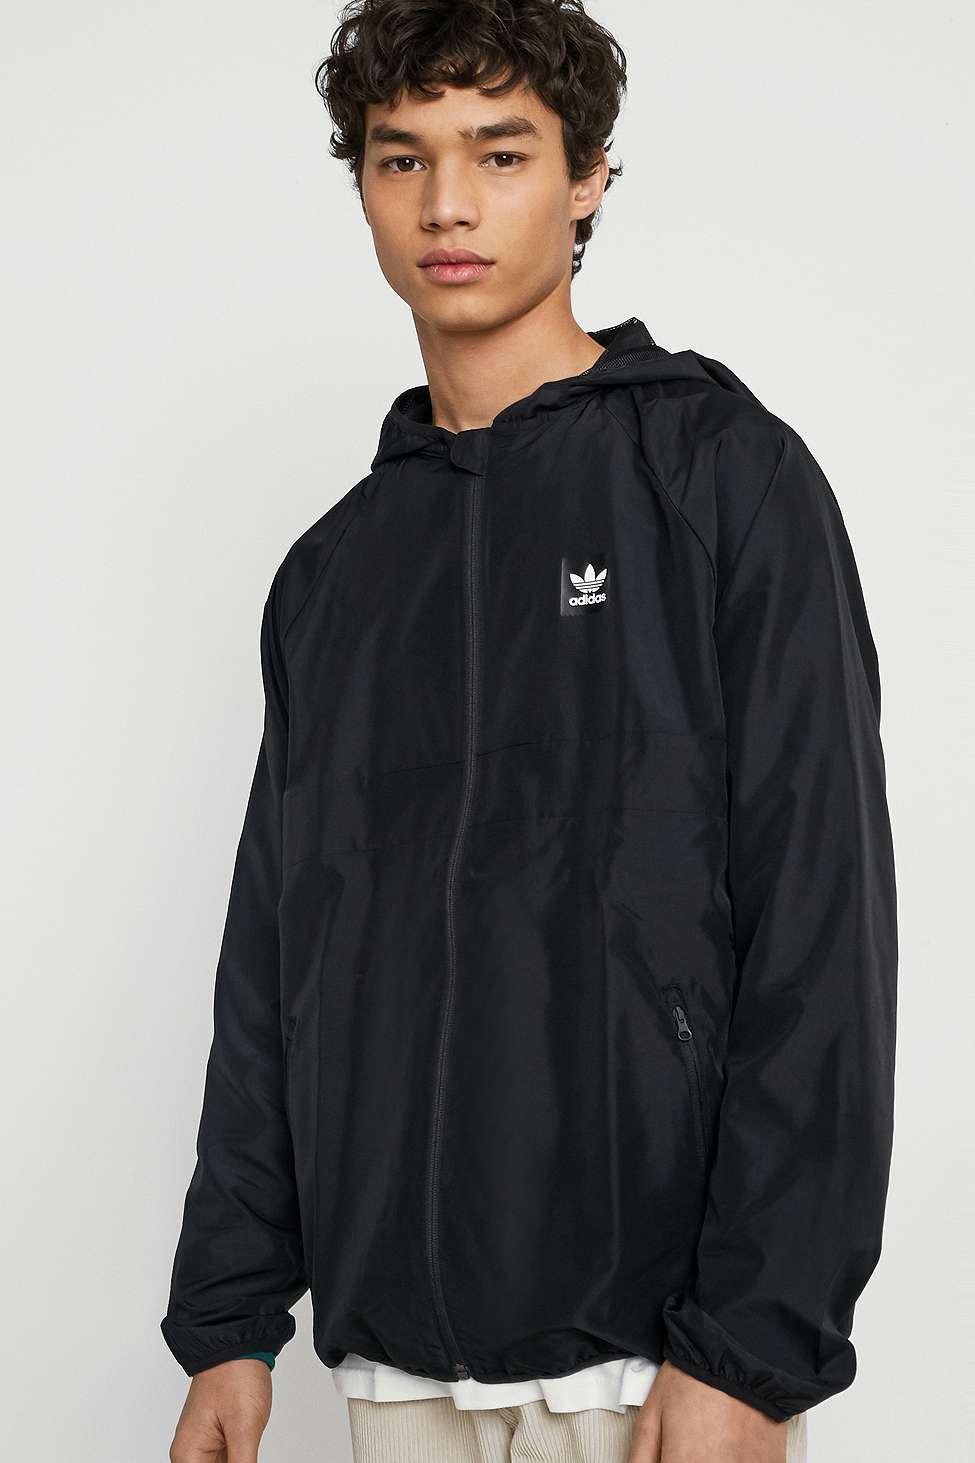 adidas originali bb neri binari giacca urban outfitters